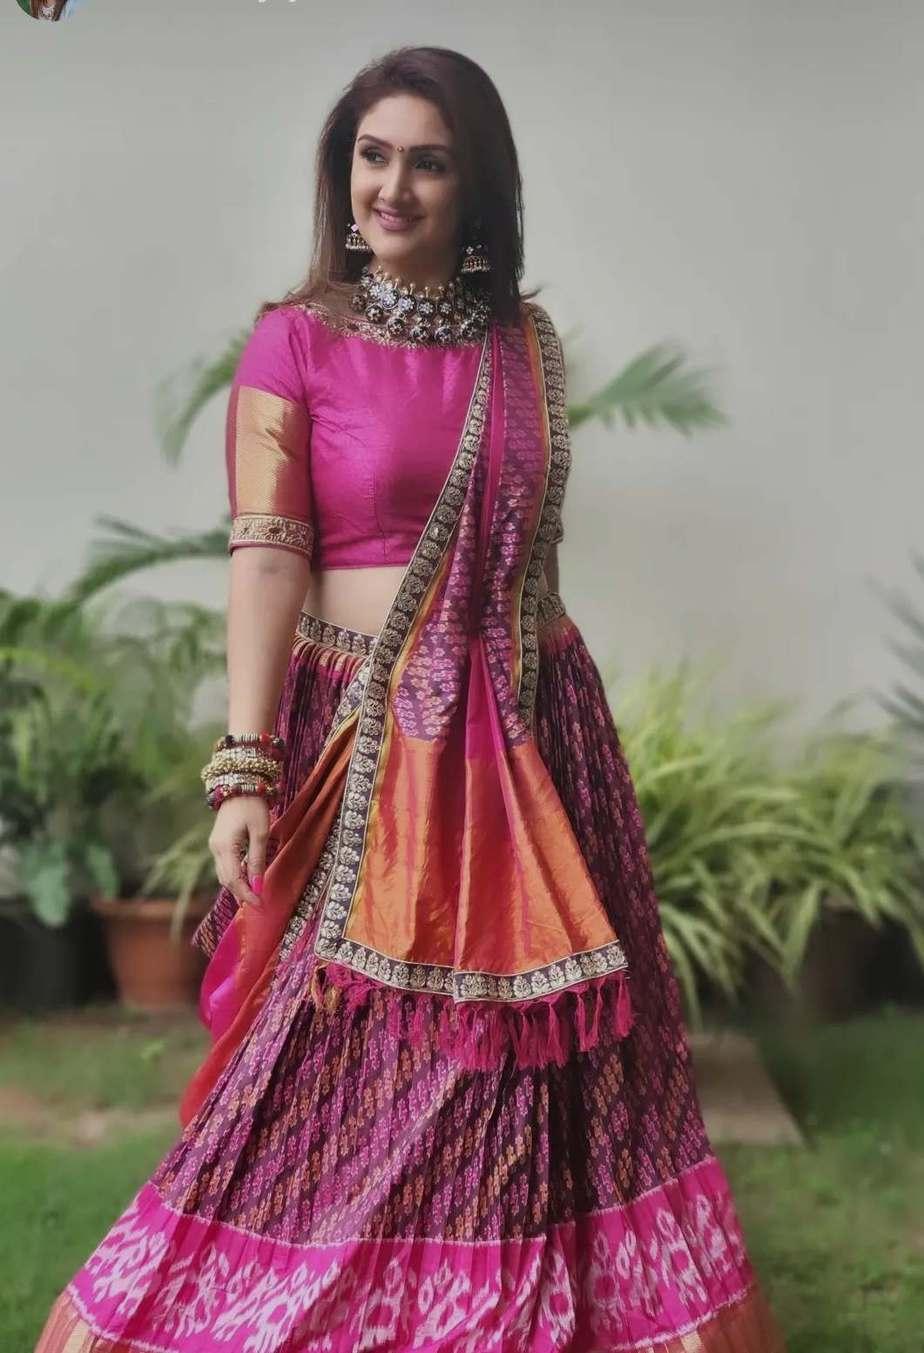 sridevi Vijaykumar in pink patola leehnga by Neeru's for comedy stars-3